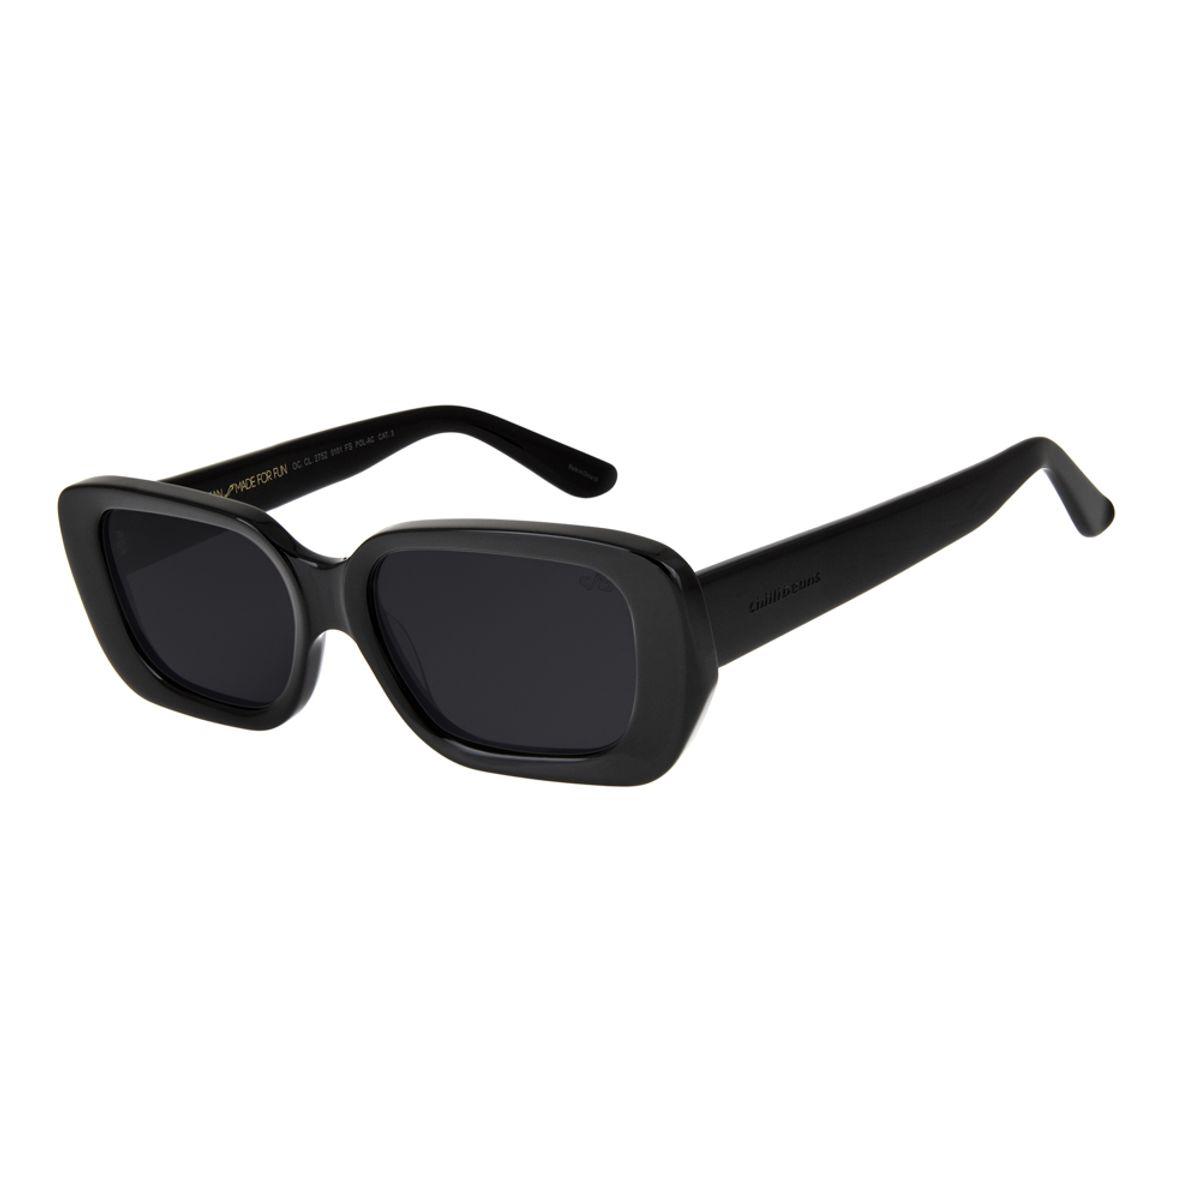 f7b93afe4 Óculos de Sol Retangular 90´s Grunge Feminino Chilli Beans Blk Preto ...